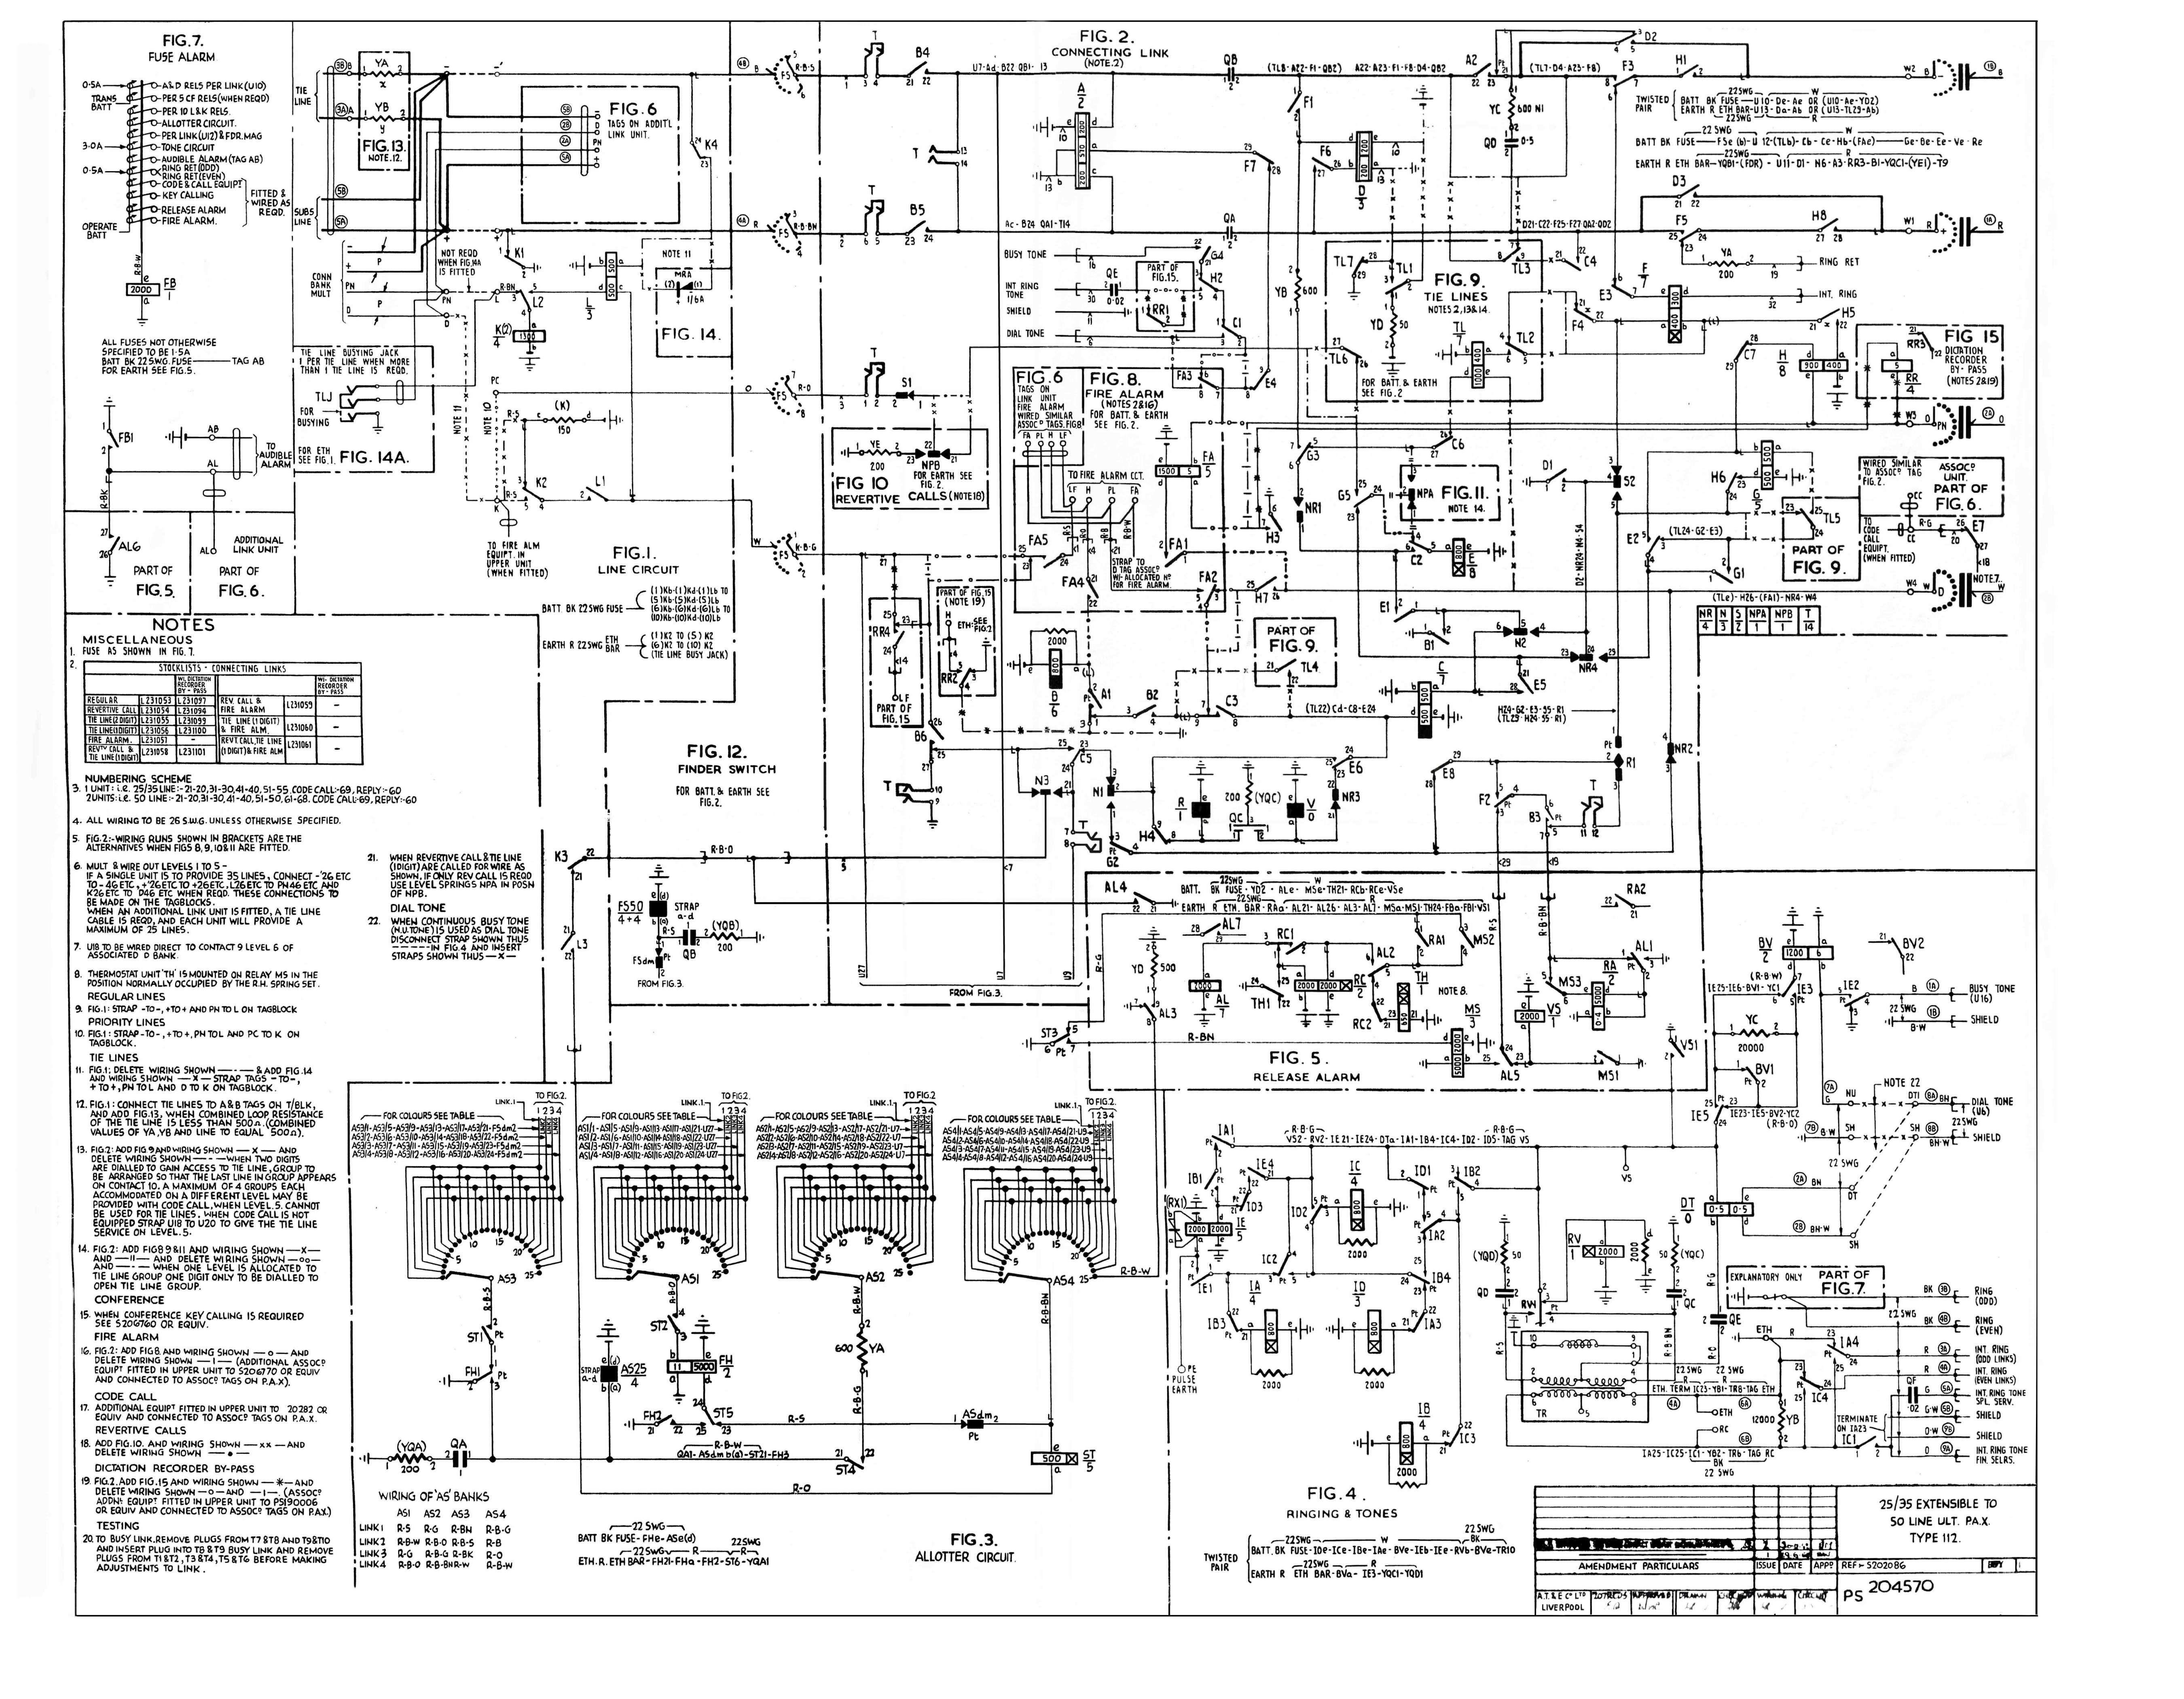 Caterpillar C7 Engine Wiring Diagram And Caterpillar C Engine Sensor Diagram Schematic Diagram How To Plan Saratoga California Map